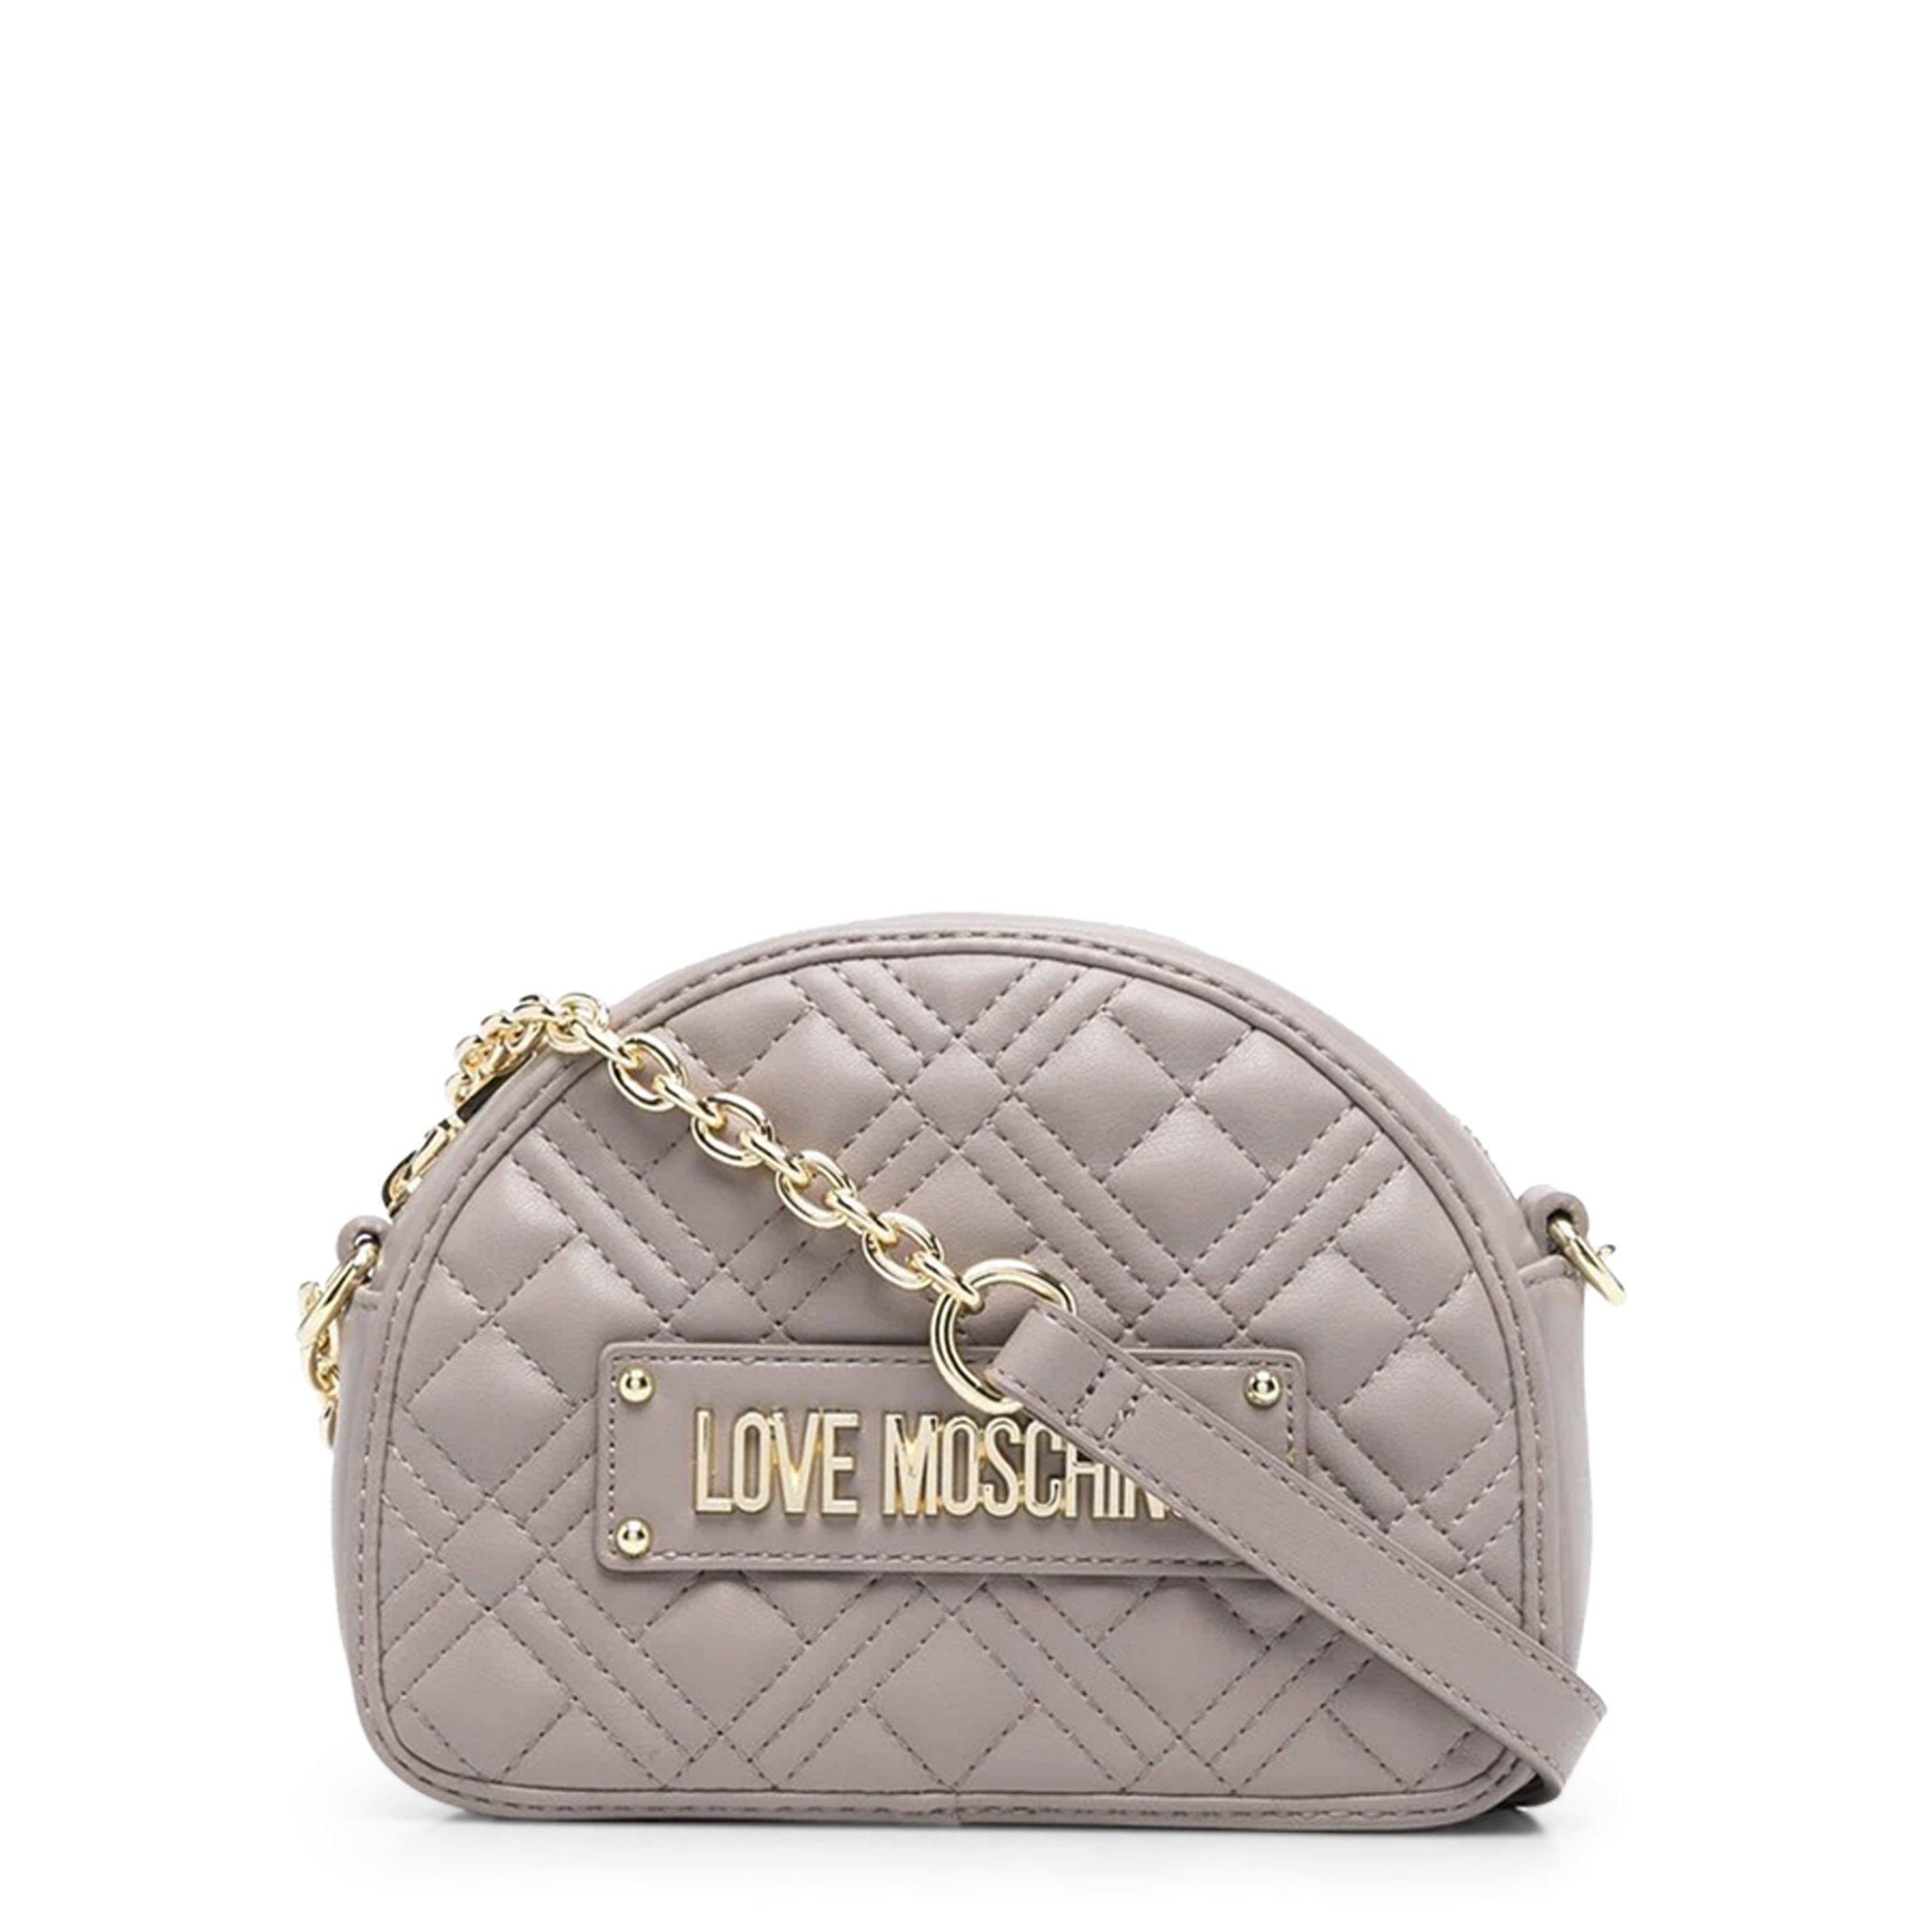 Love Moschino Women's Crossbody Bag Various Colours JC4004PP1DLA0 - grey NOSIZE